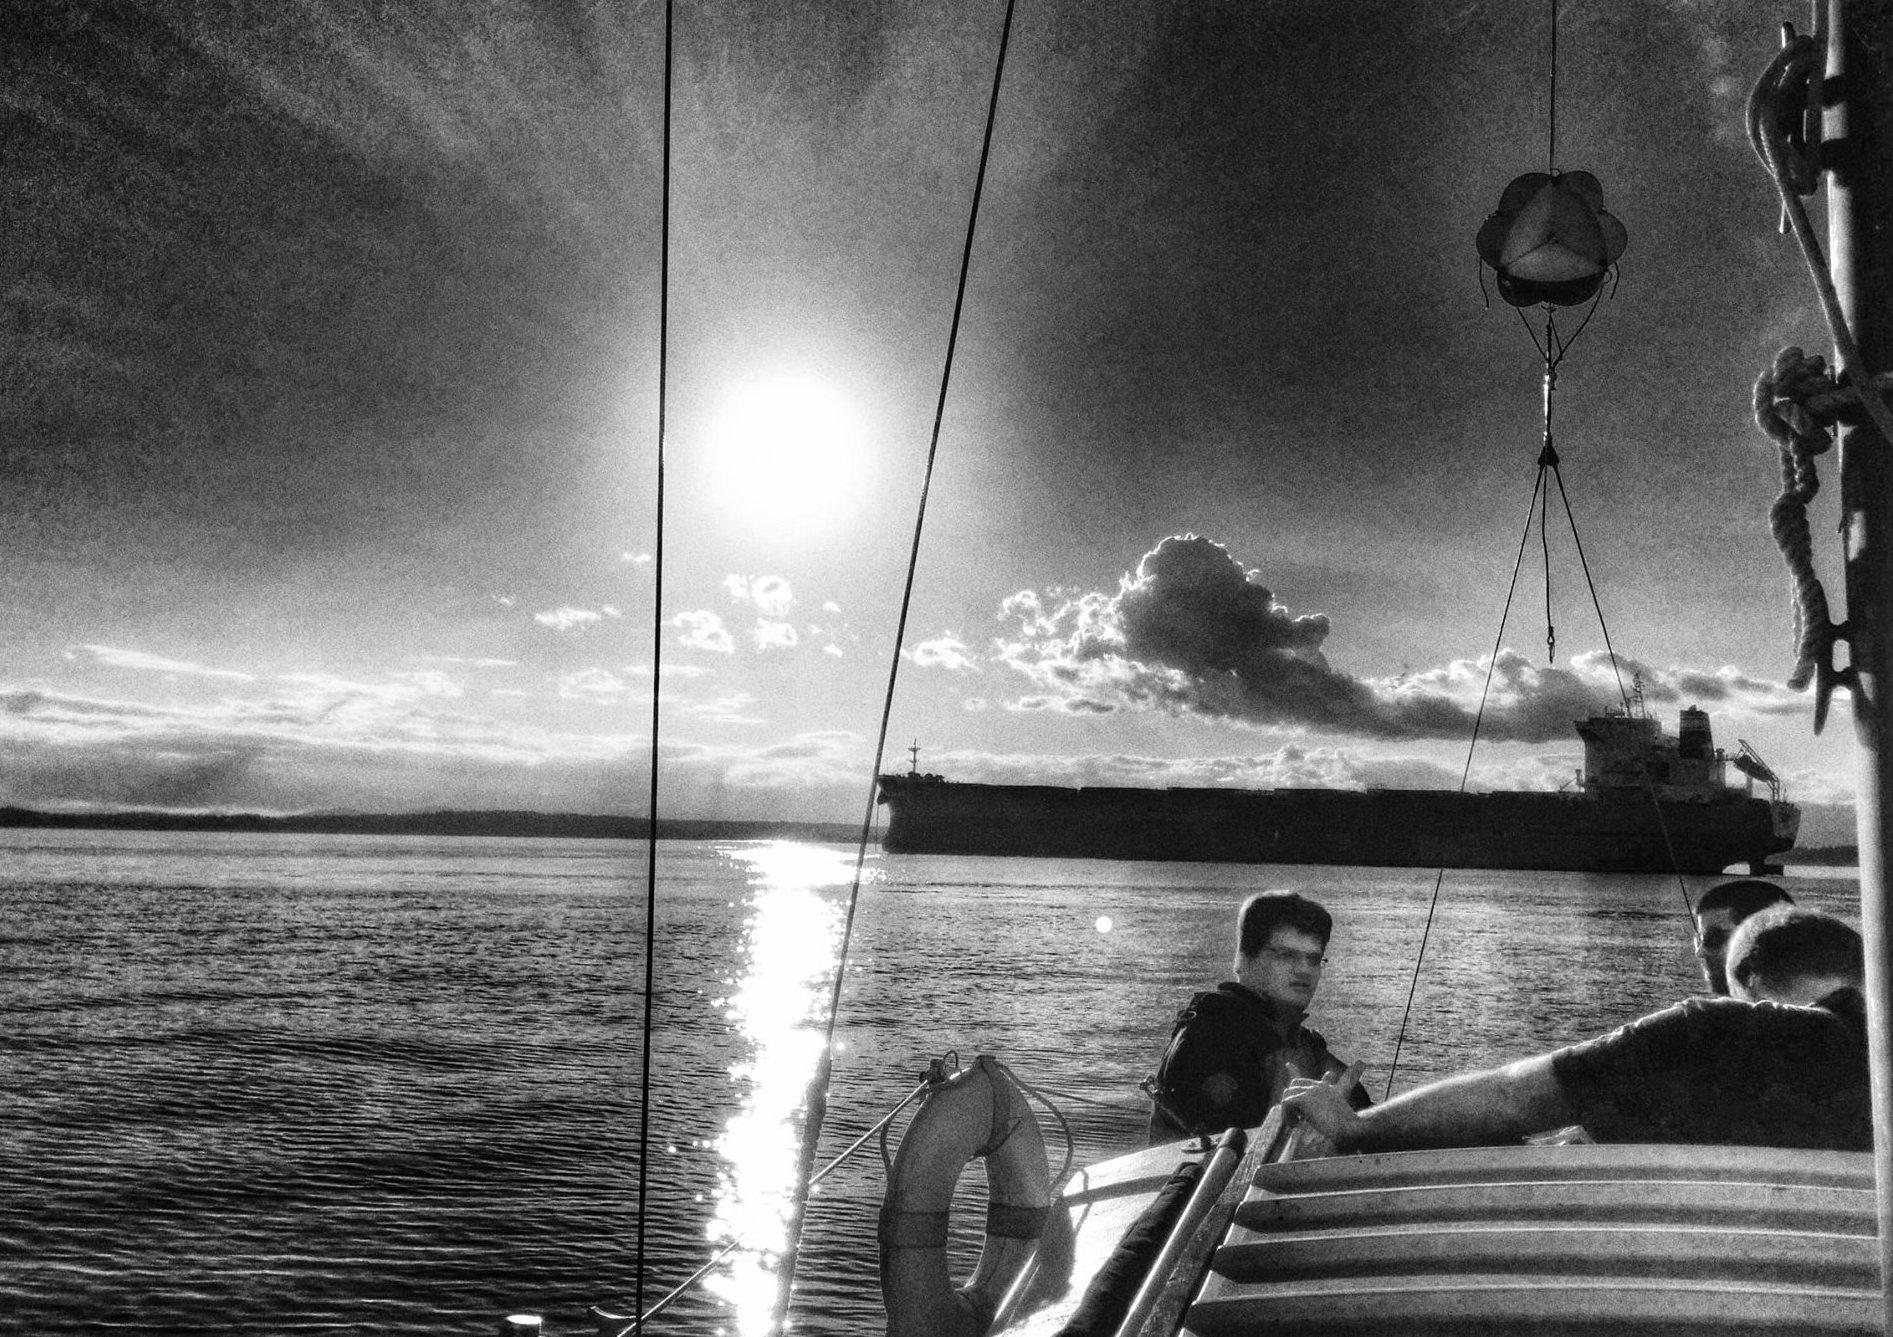 Elliot Bay, Seattle sailing. Photo by Jason Alexander